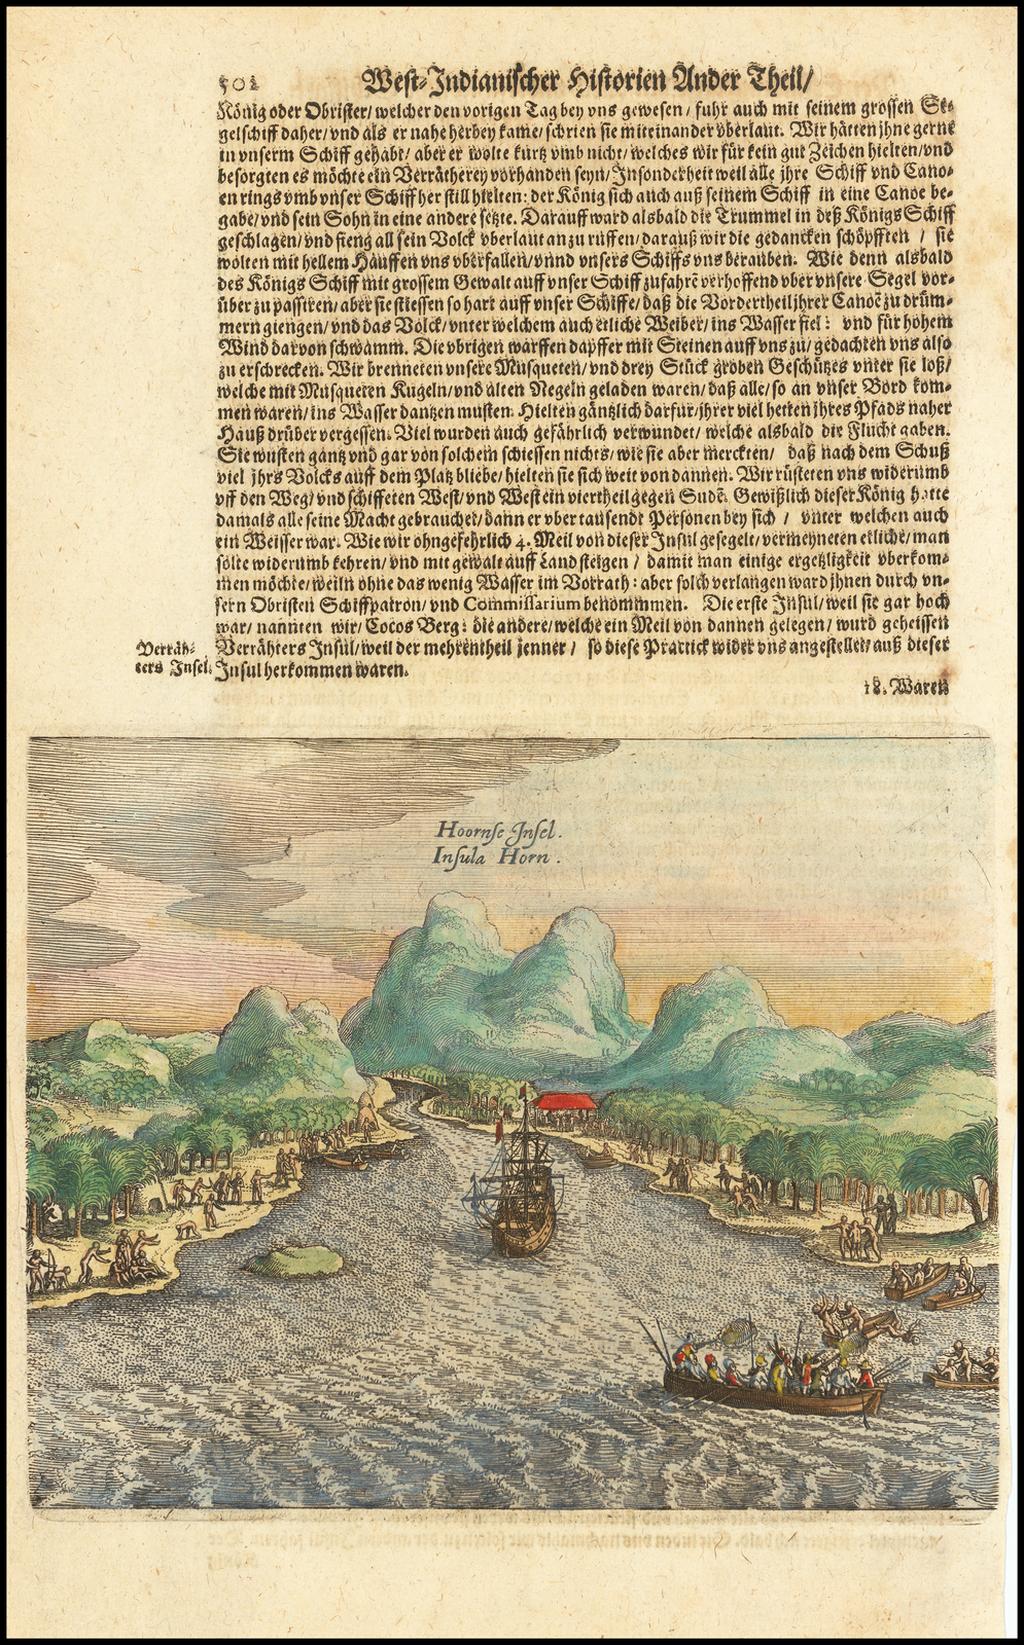 Hoornse Insel. Insula Horn. By Theodor De Bry / Matthaeus Merian